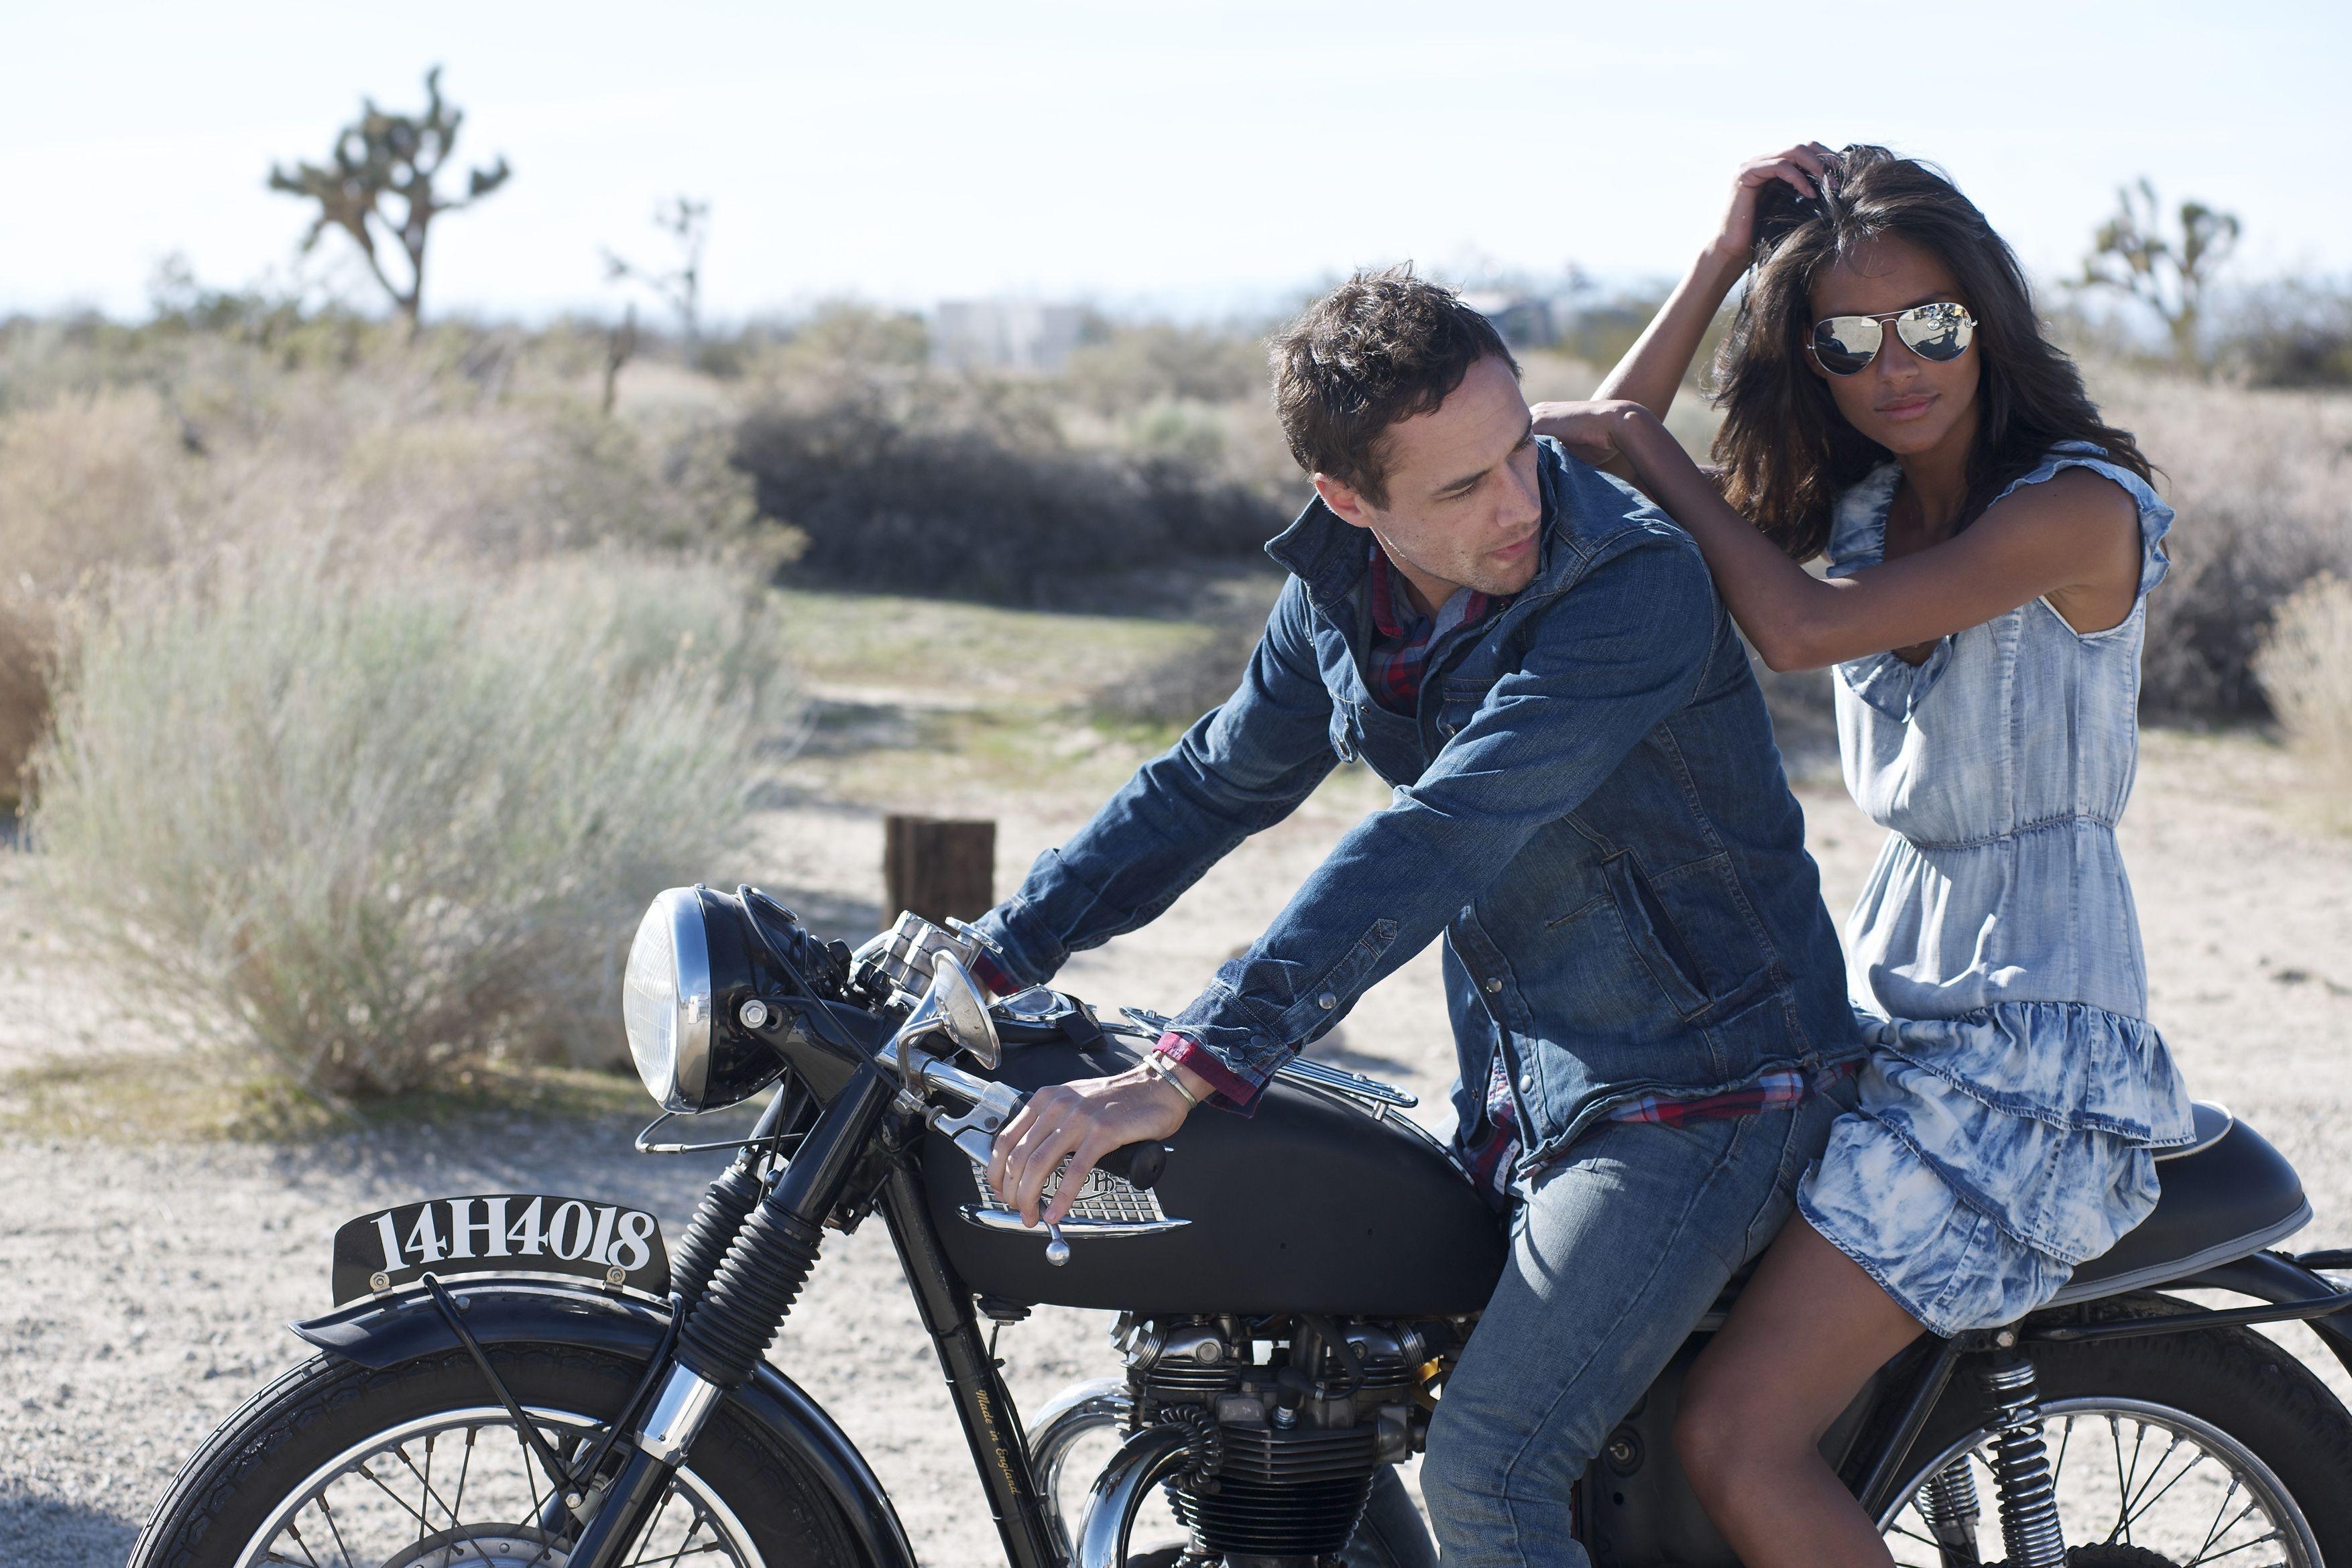 dating moottori pyörä kaverit dating BPD uros